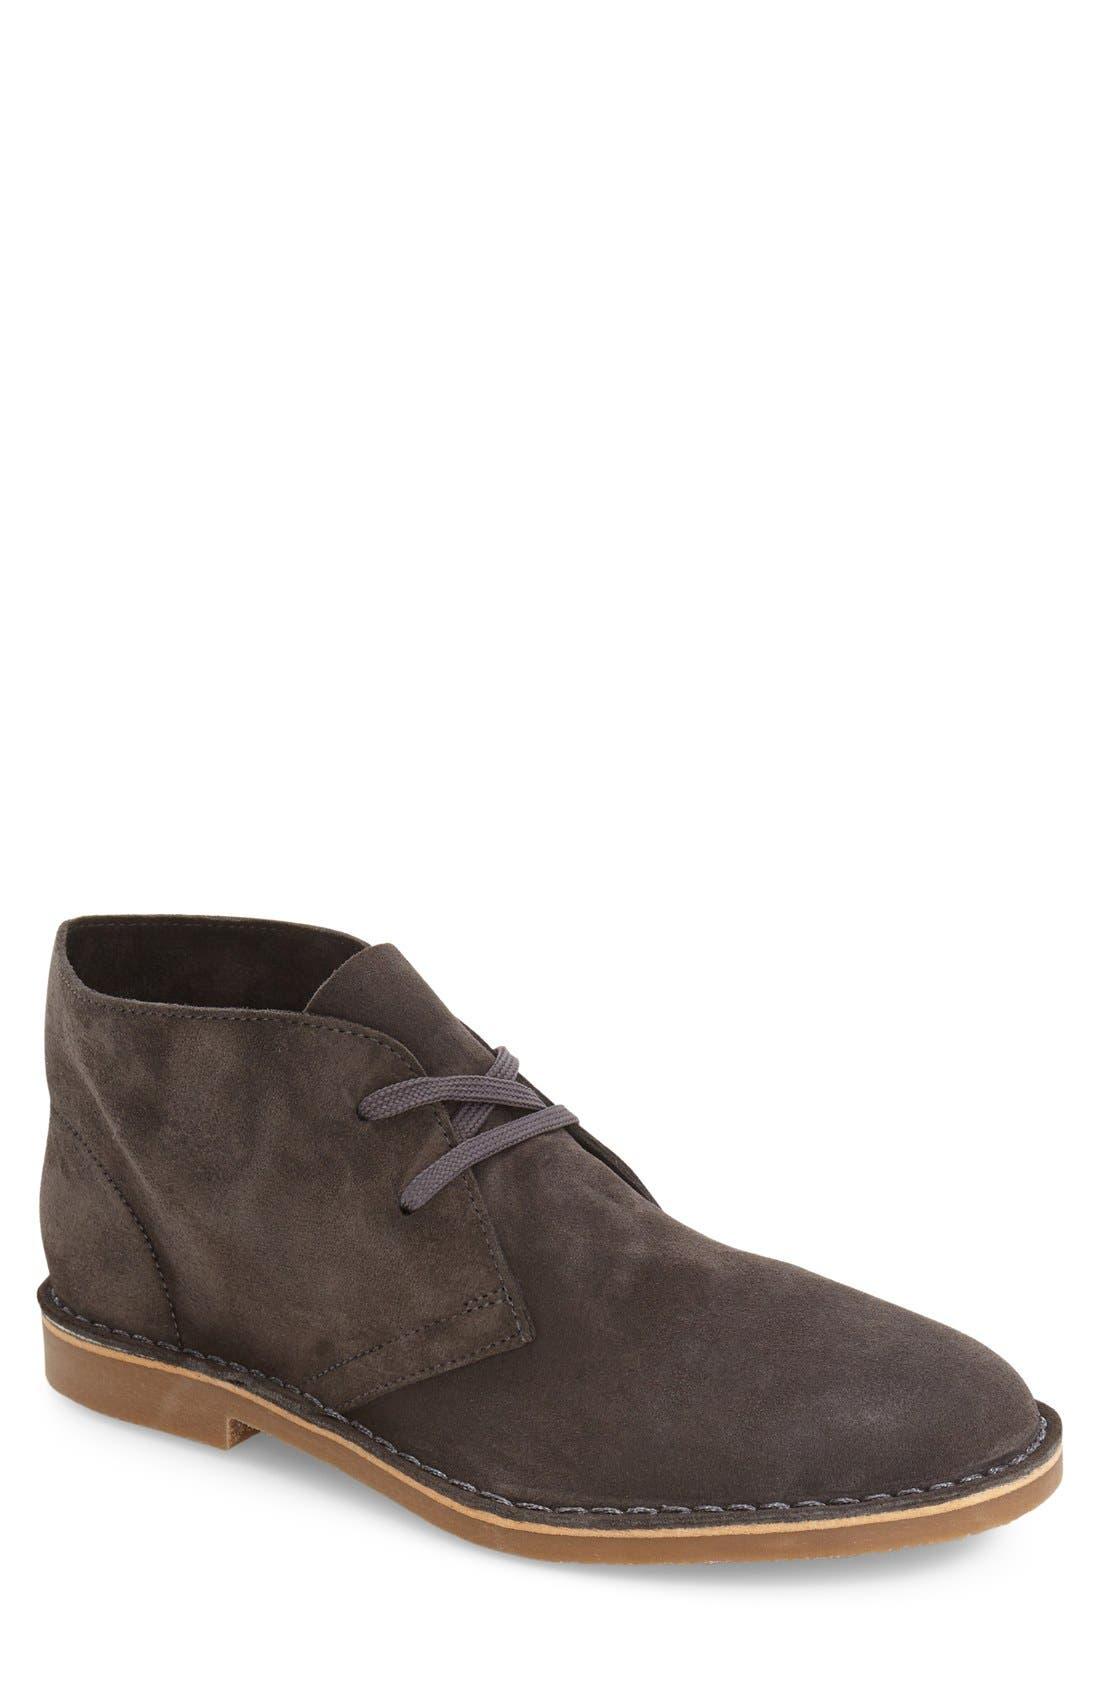 'Greyson' Chukka Boot, Main, color, 020